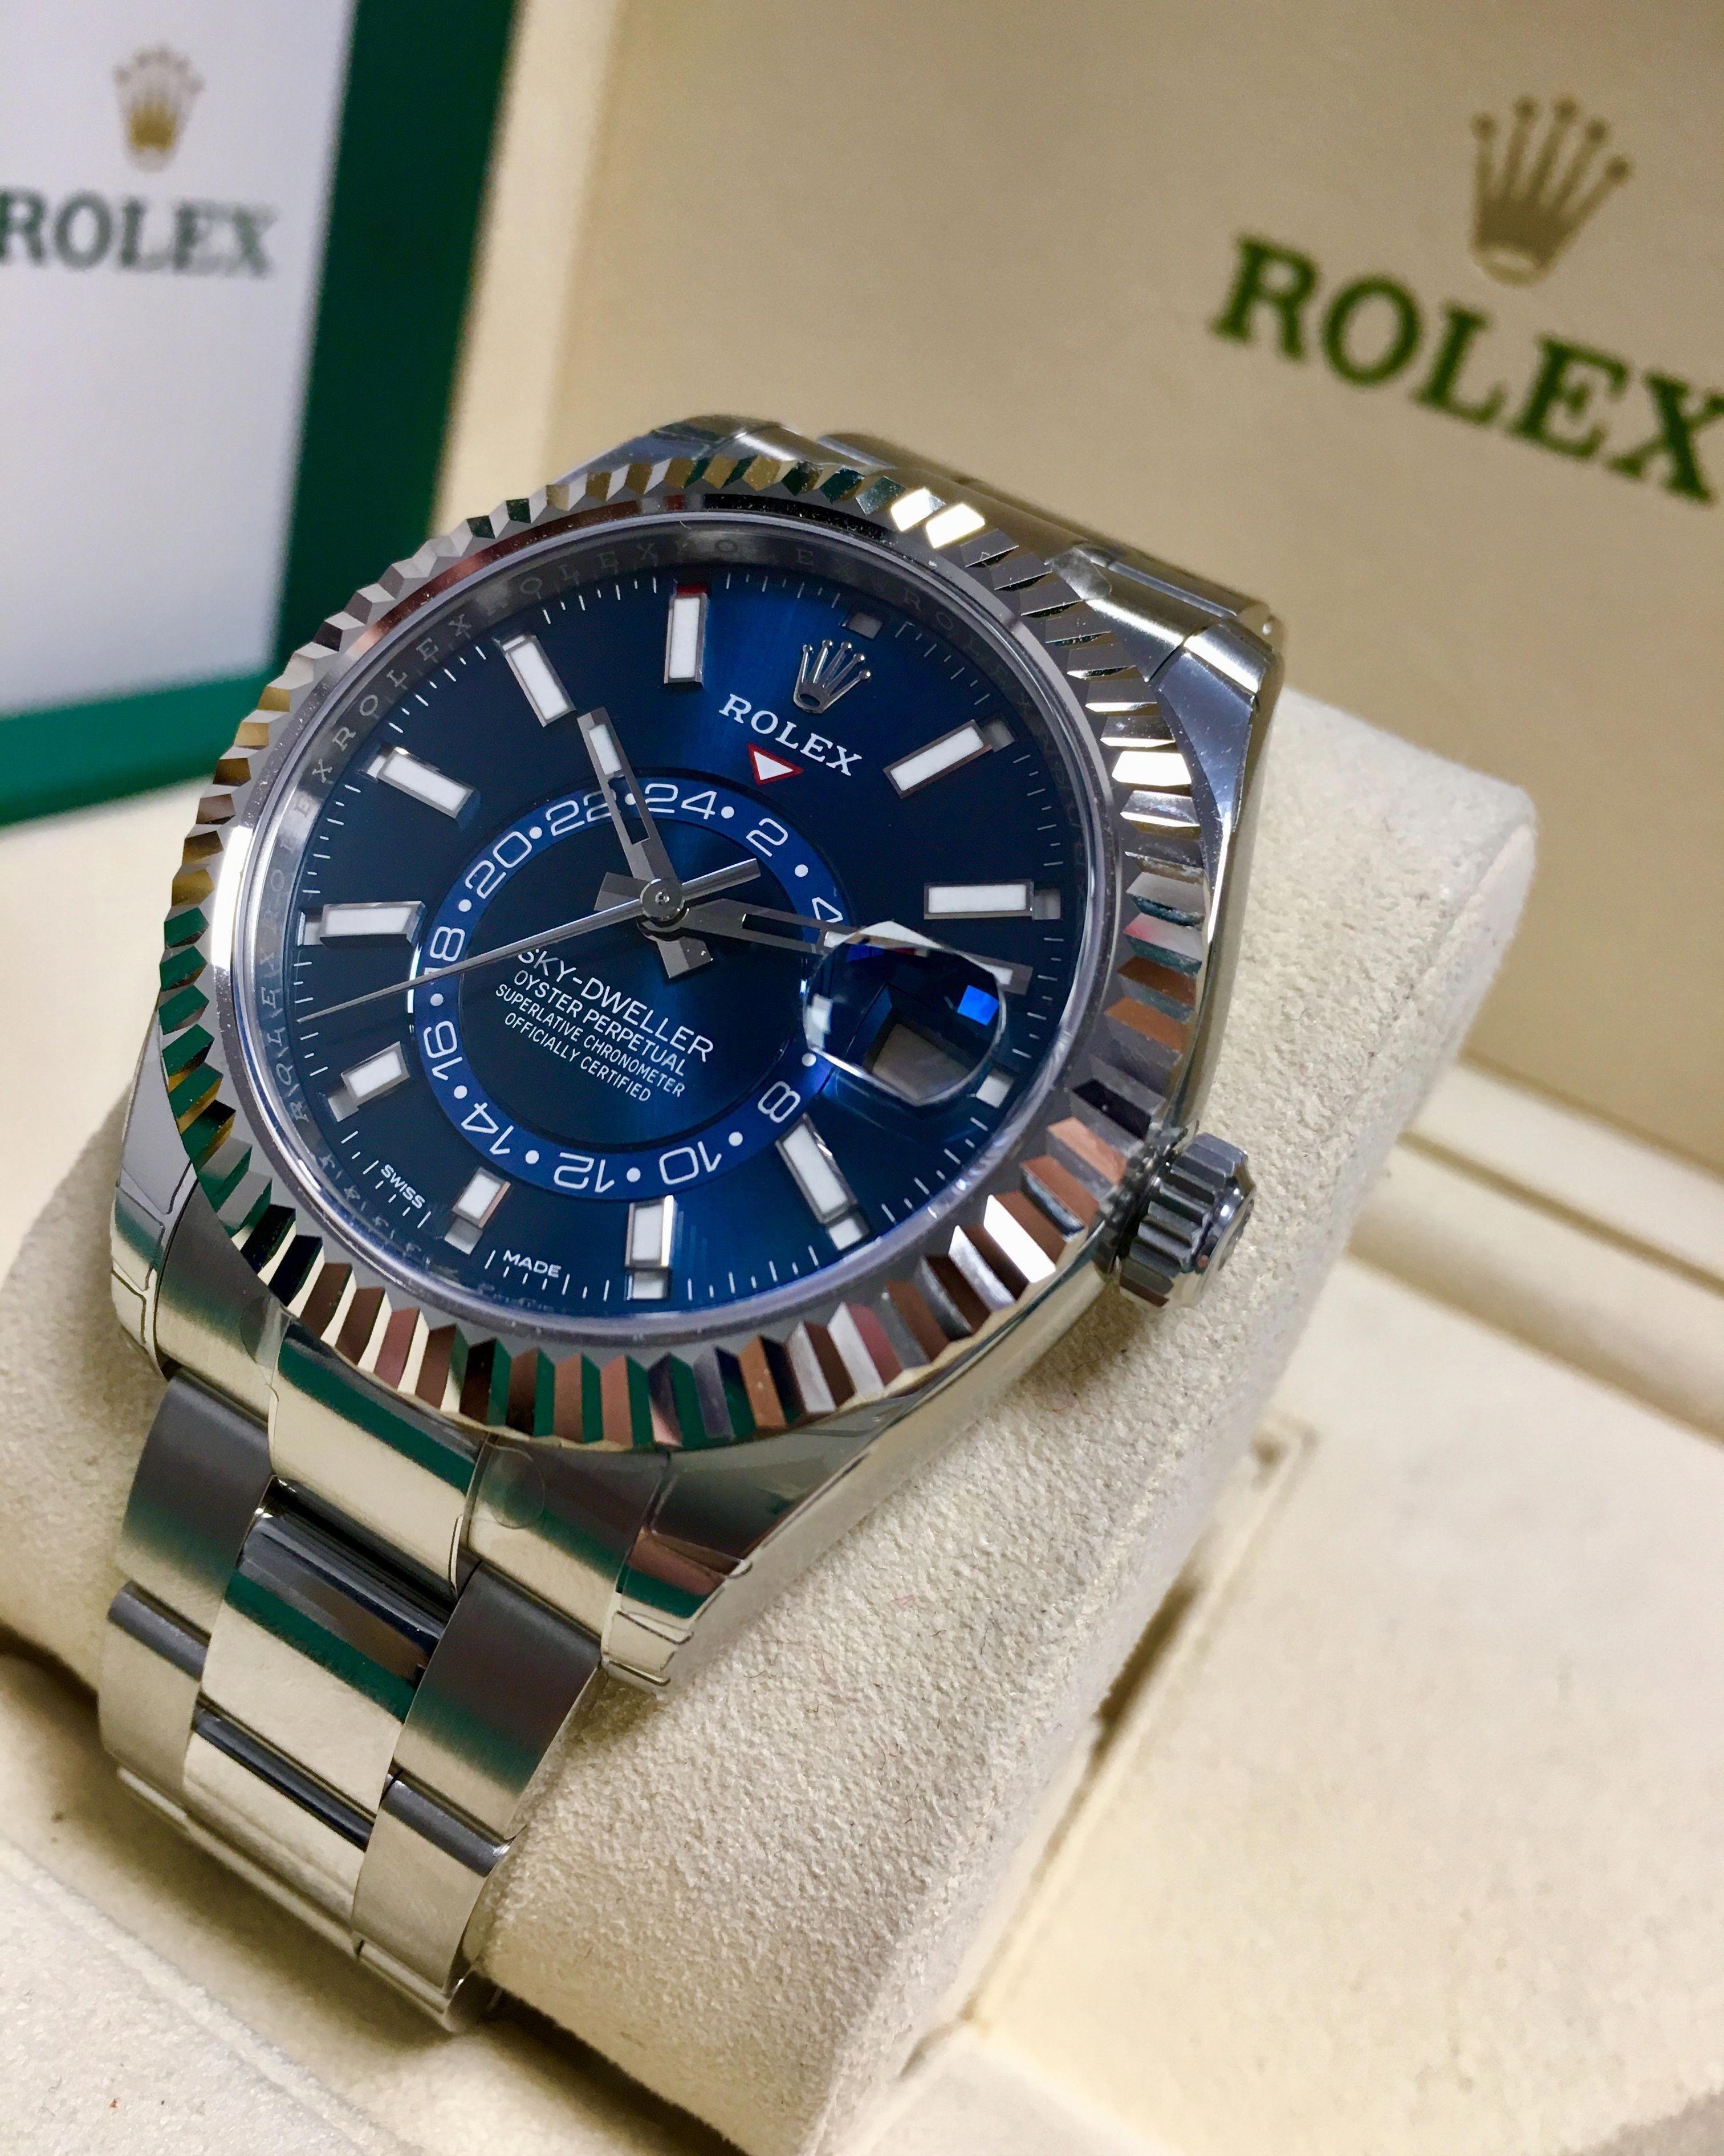 Rolex Sky Dweller Stainless Steel Blue Dial 326934 Menswatches Rolex Watches Rolex Luxury Watches For Men